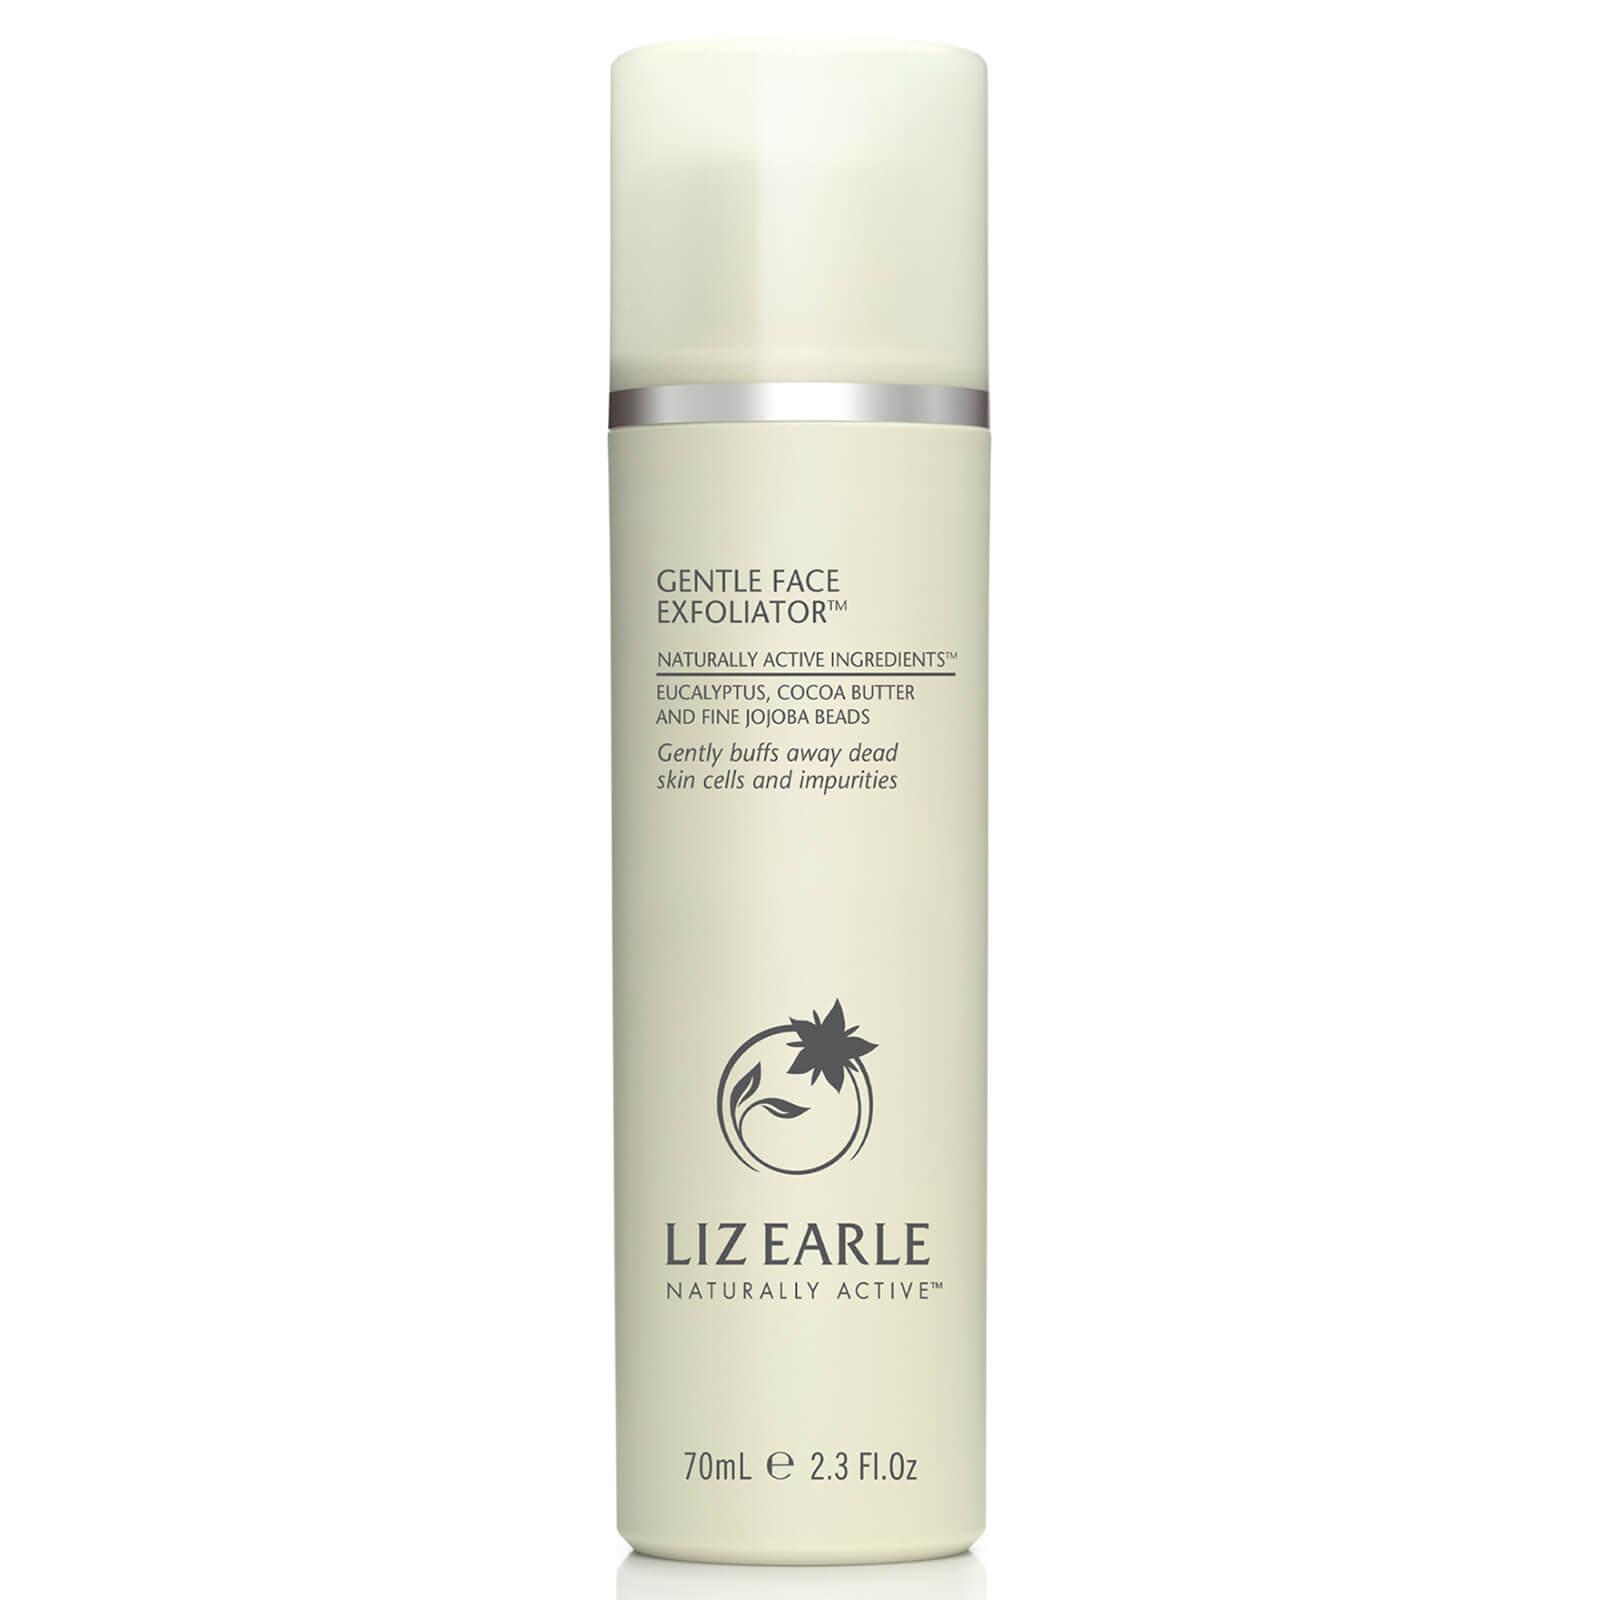 Liz Earle Gentle Face Exfoliator 70ml Pump